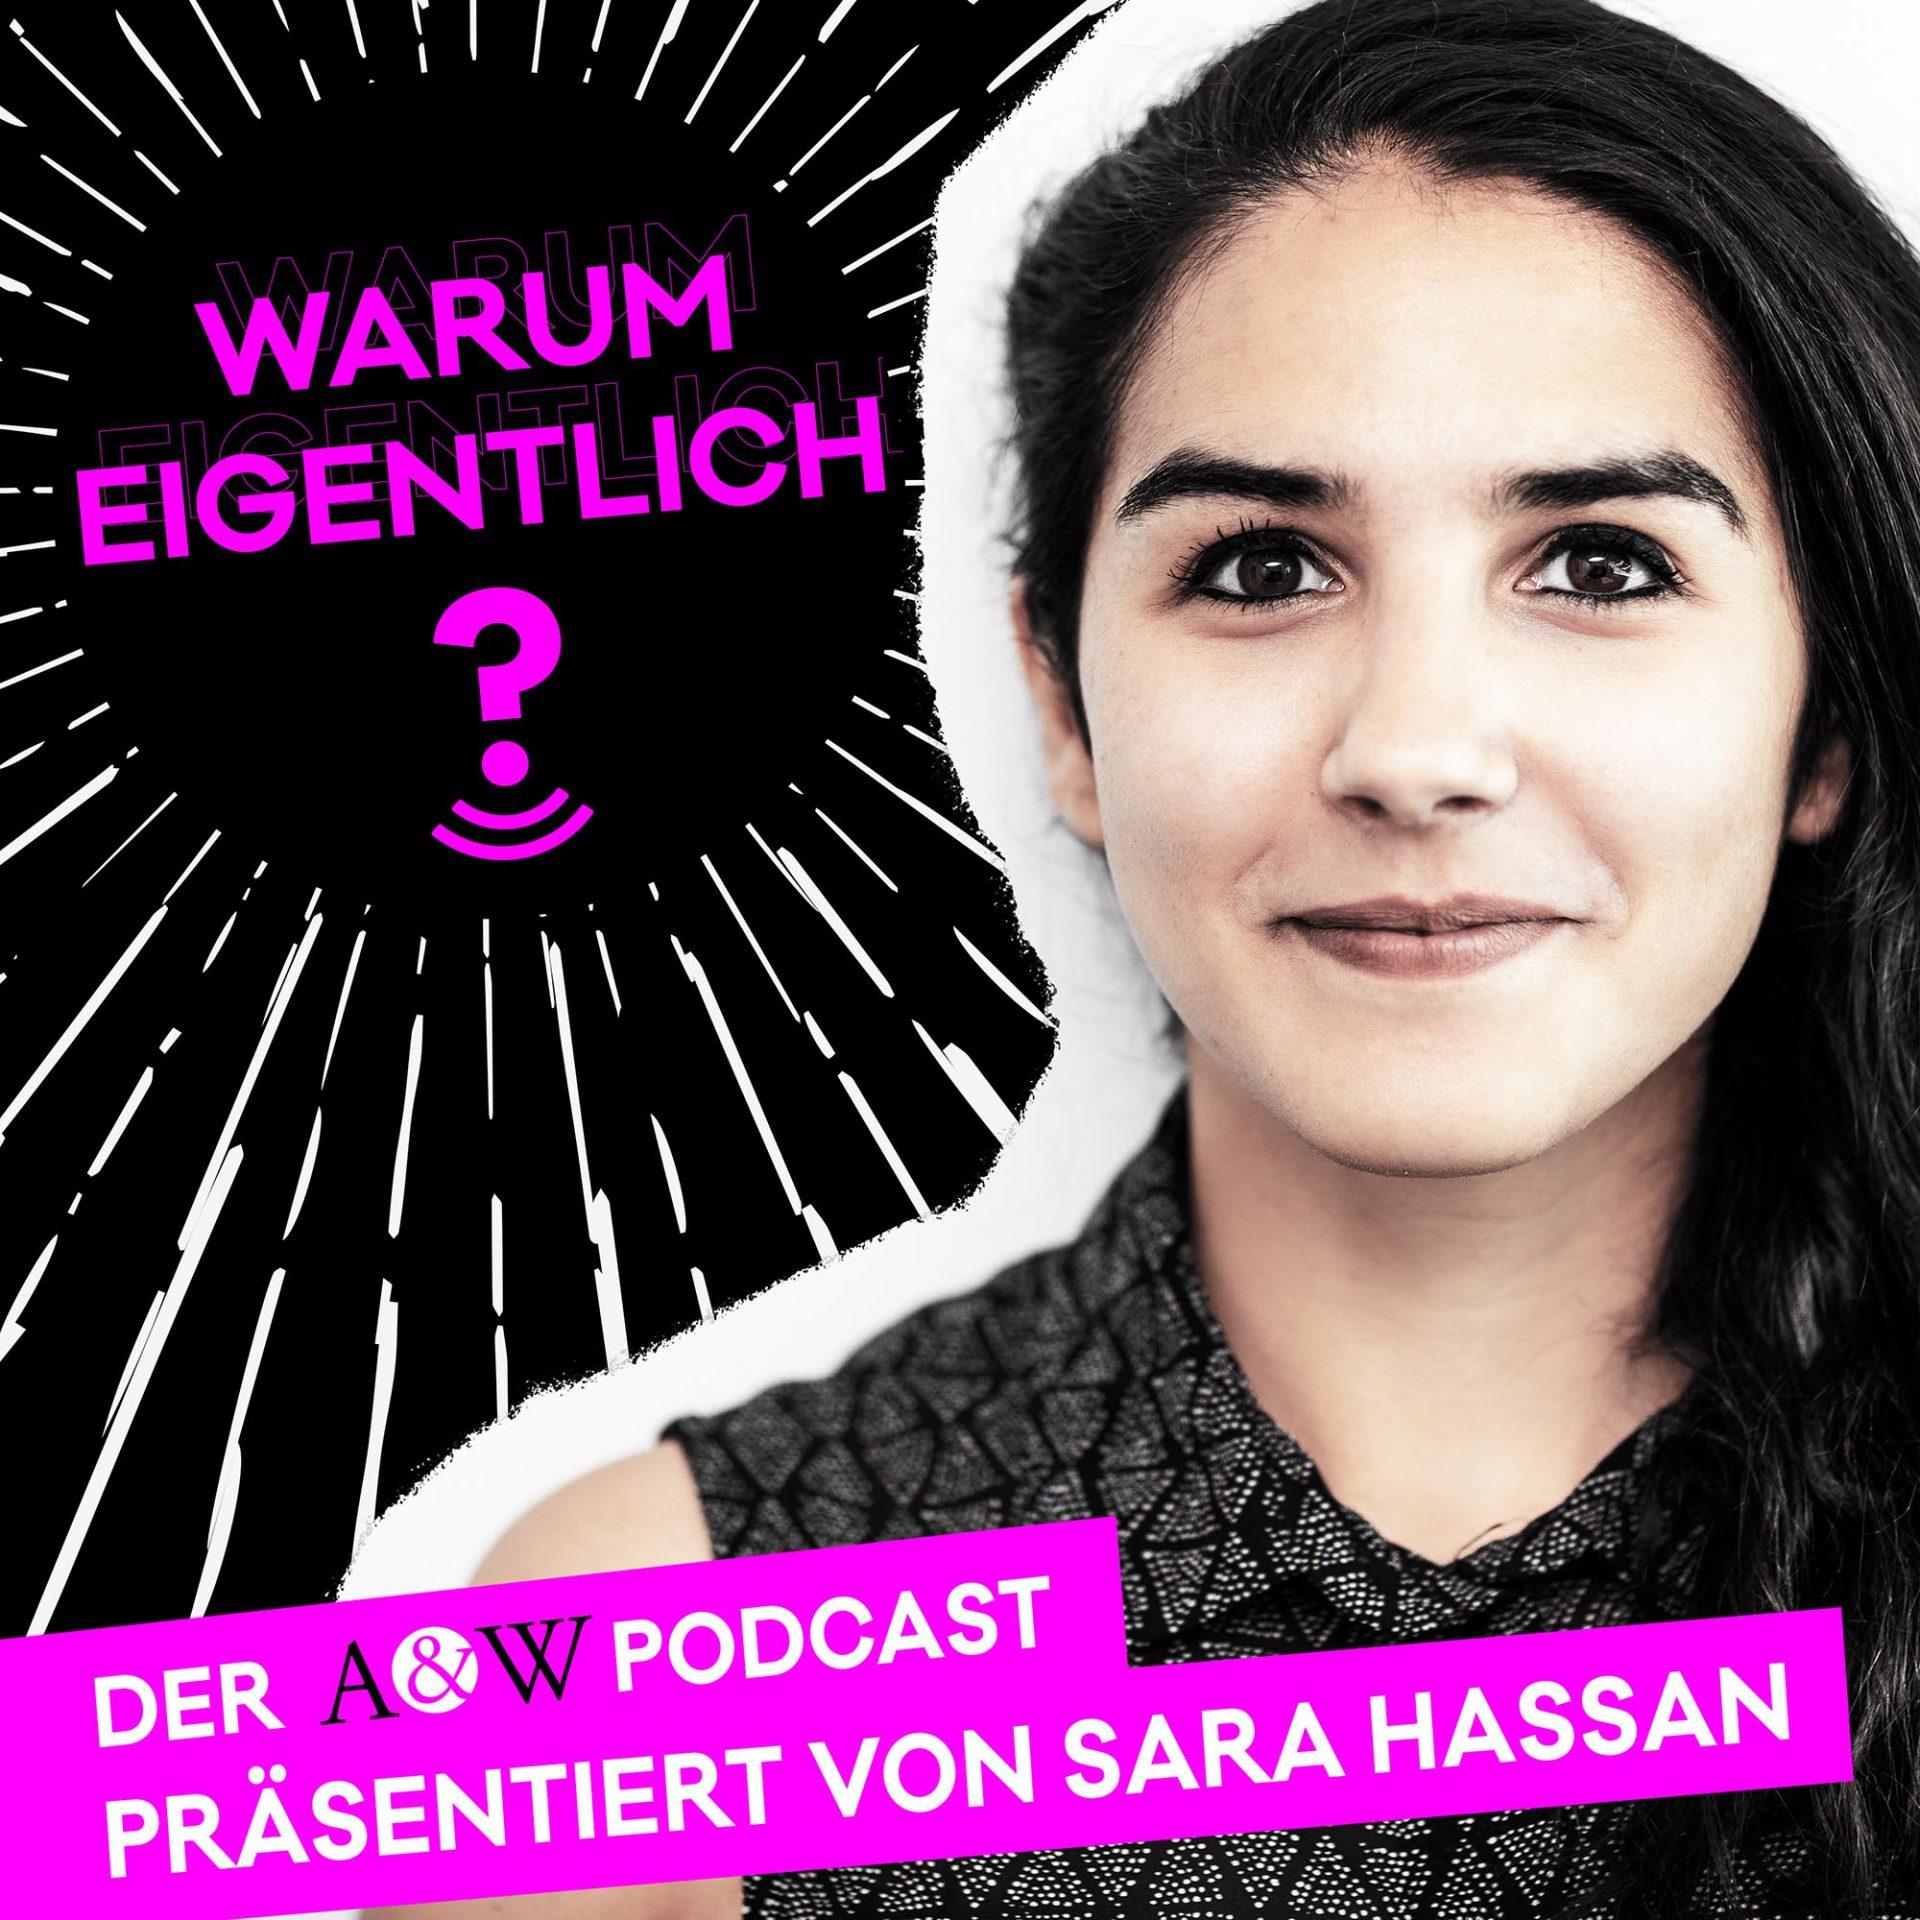 Podcast mit Sara Hassan